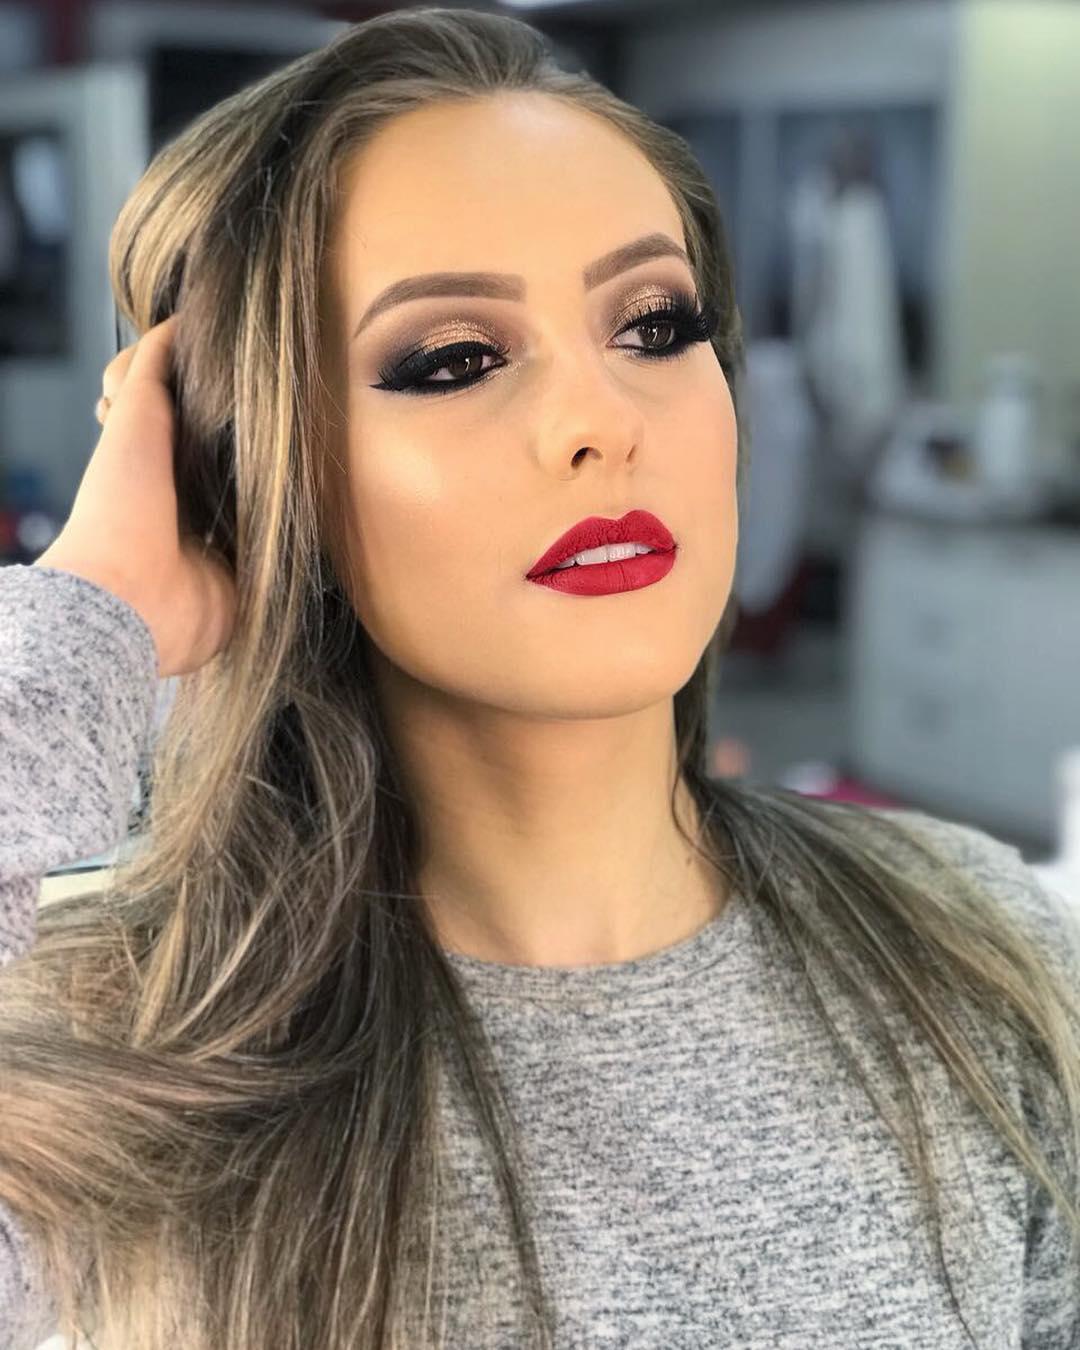 cristine boff sartor, segunda finalista de miss latinoamerica 2019. 22221110